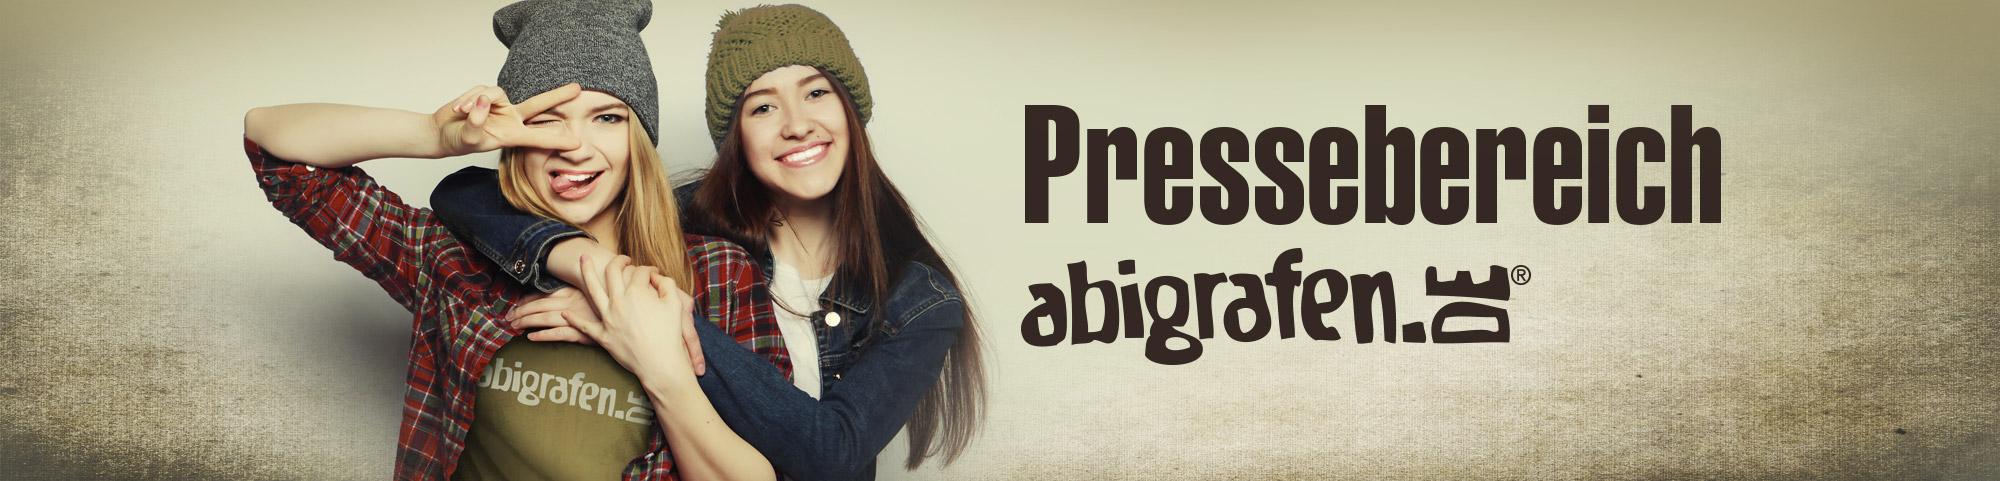 abigrafen.de GmbH - Pressebereich